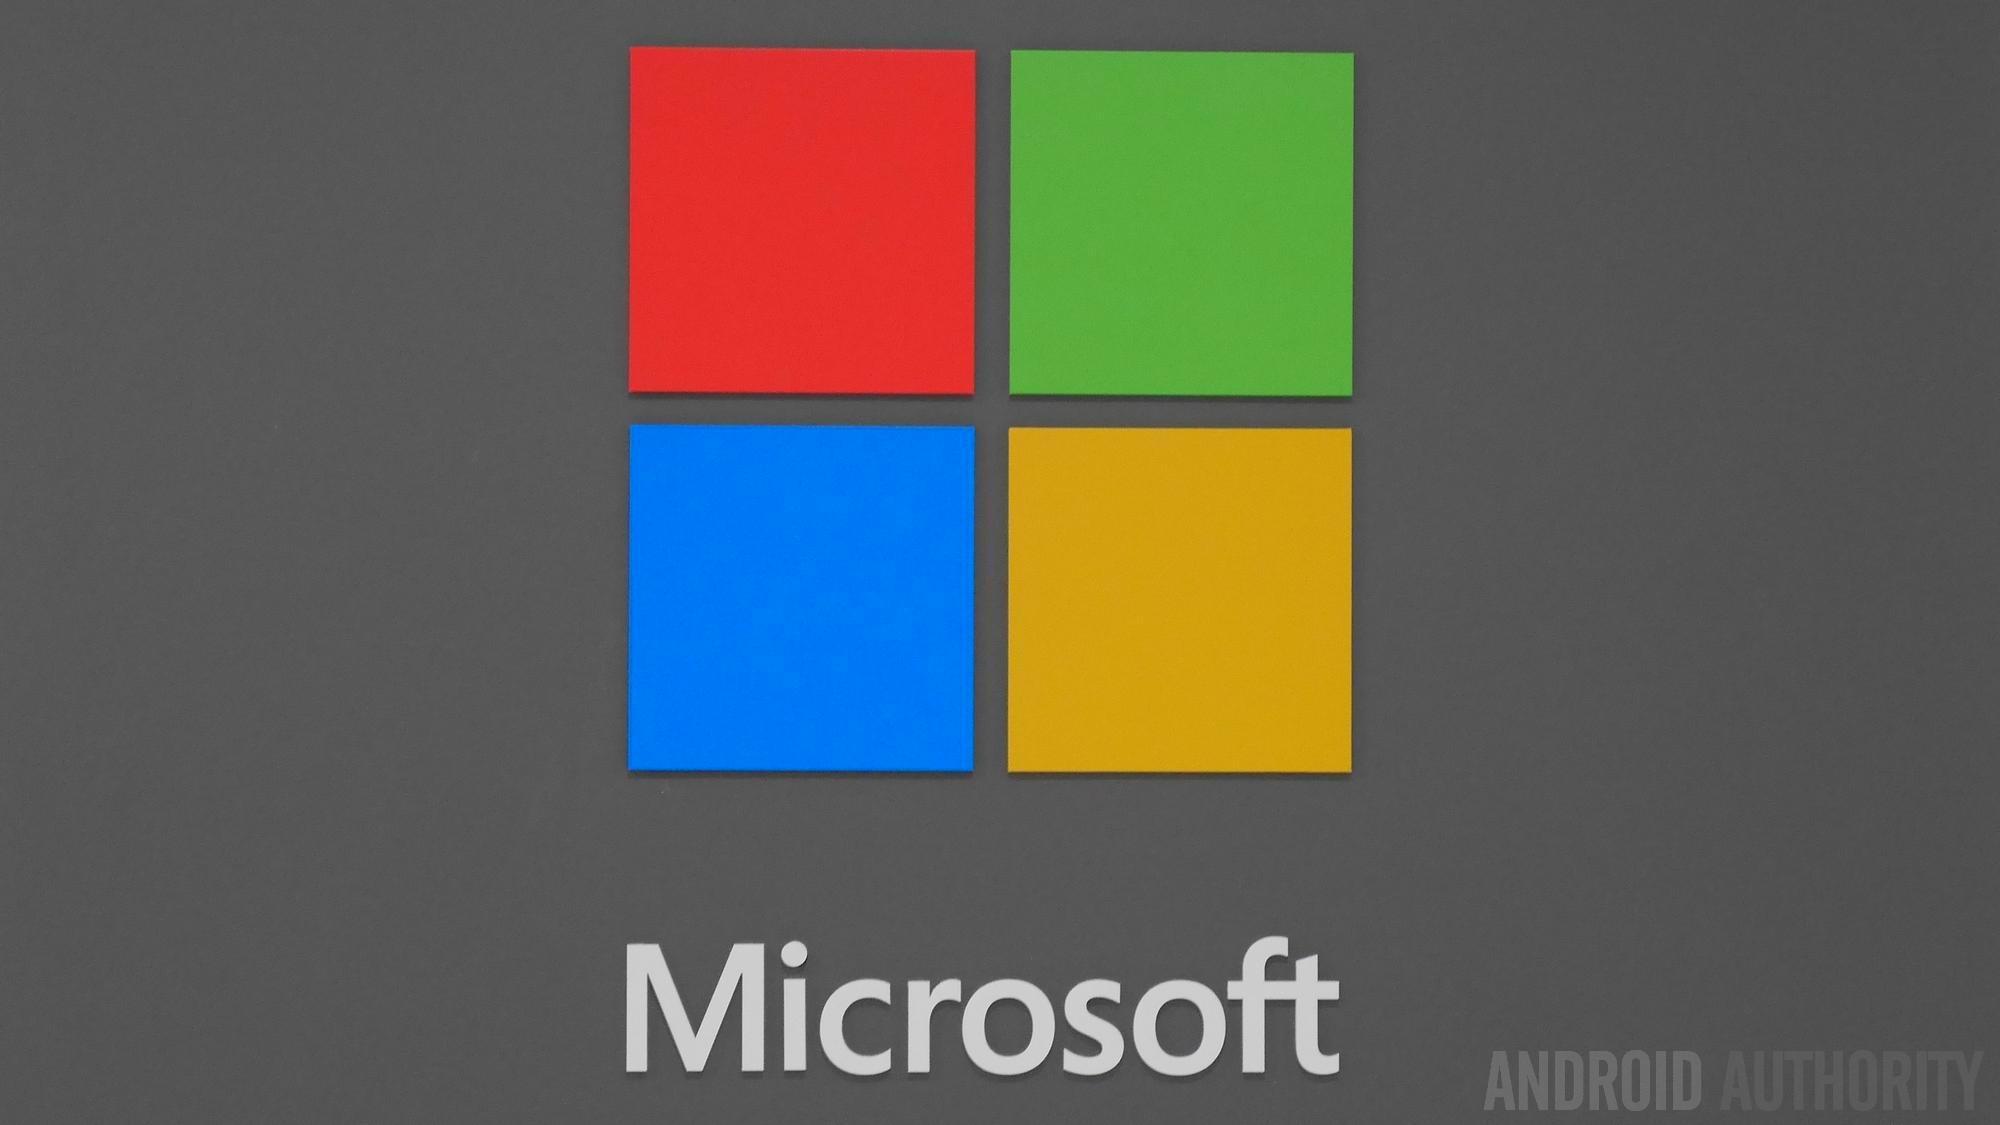 microsoft logo mwc 2015 5